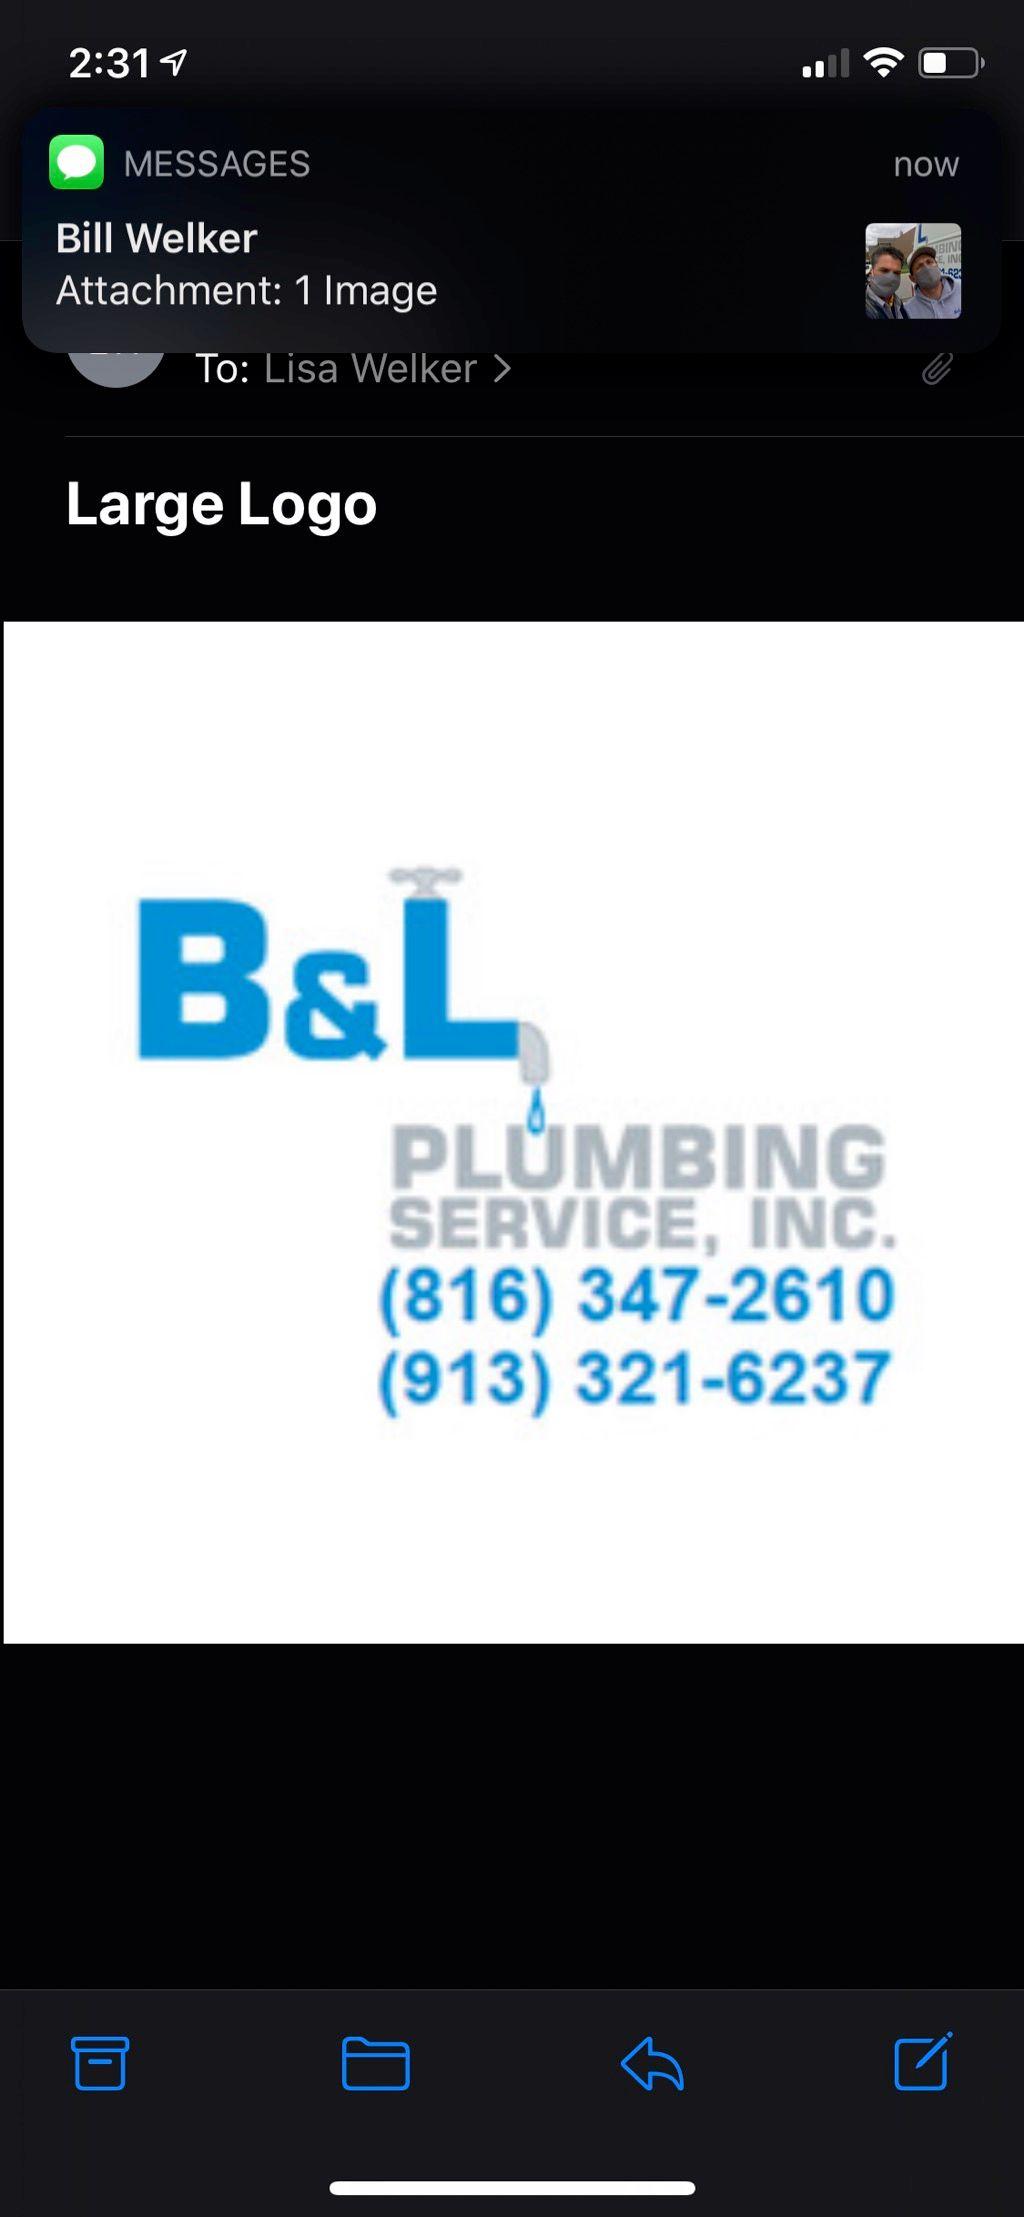 B&L Plumbing Service, Inc.